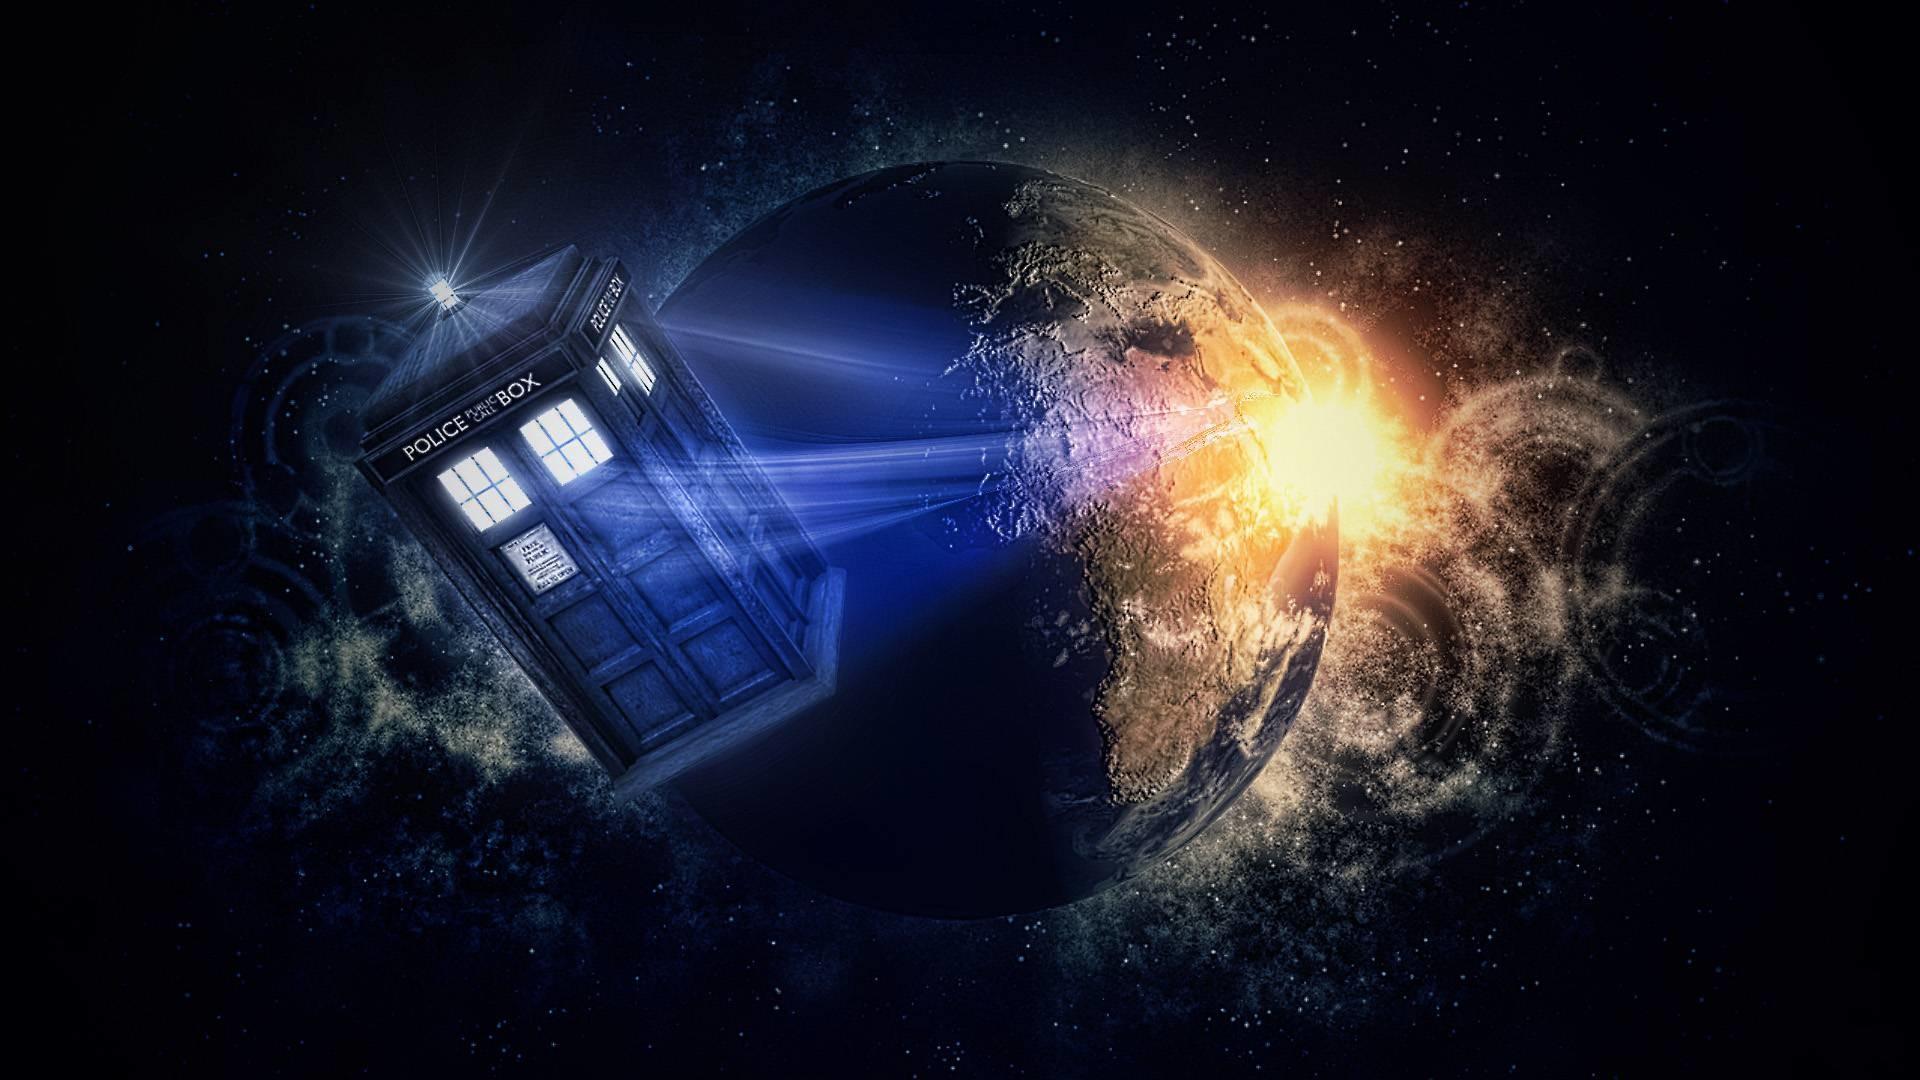 Beautiful Wallpaper Home Screen Doctor Who - 173331  Pic_197517.jpg